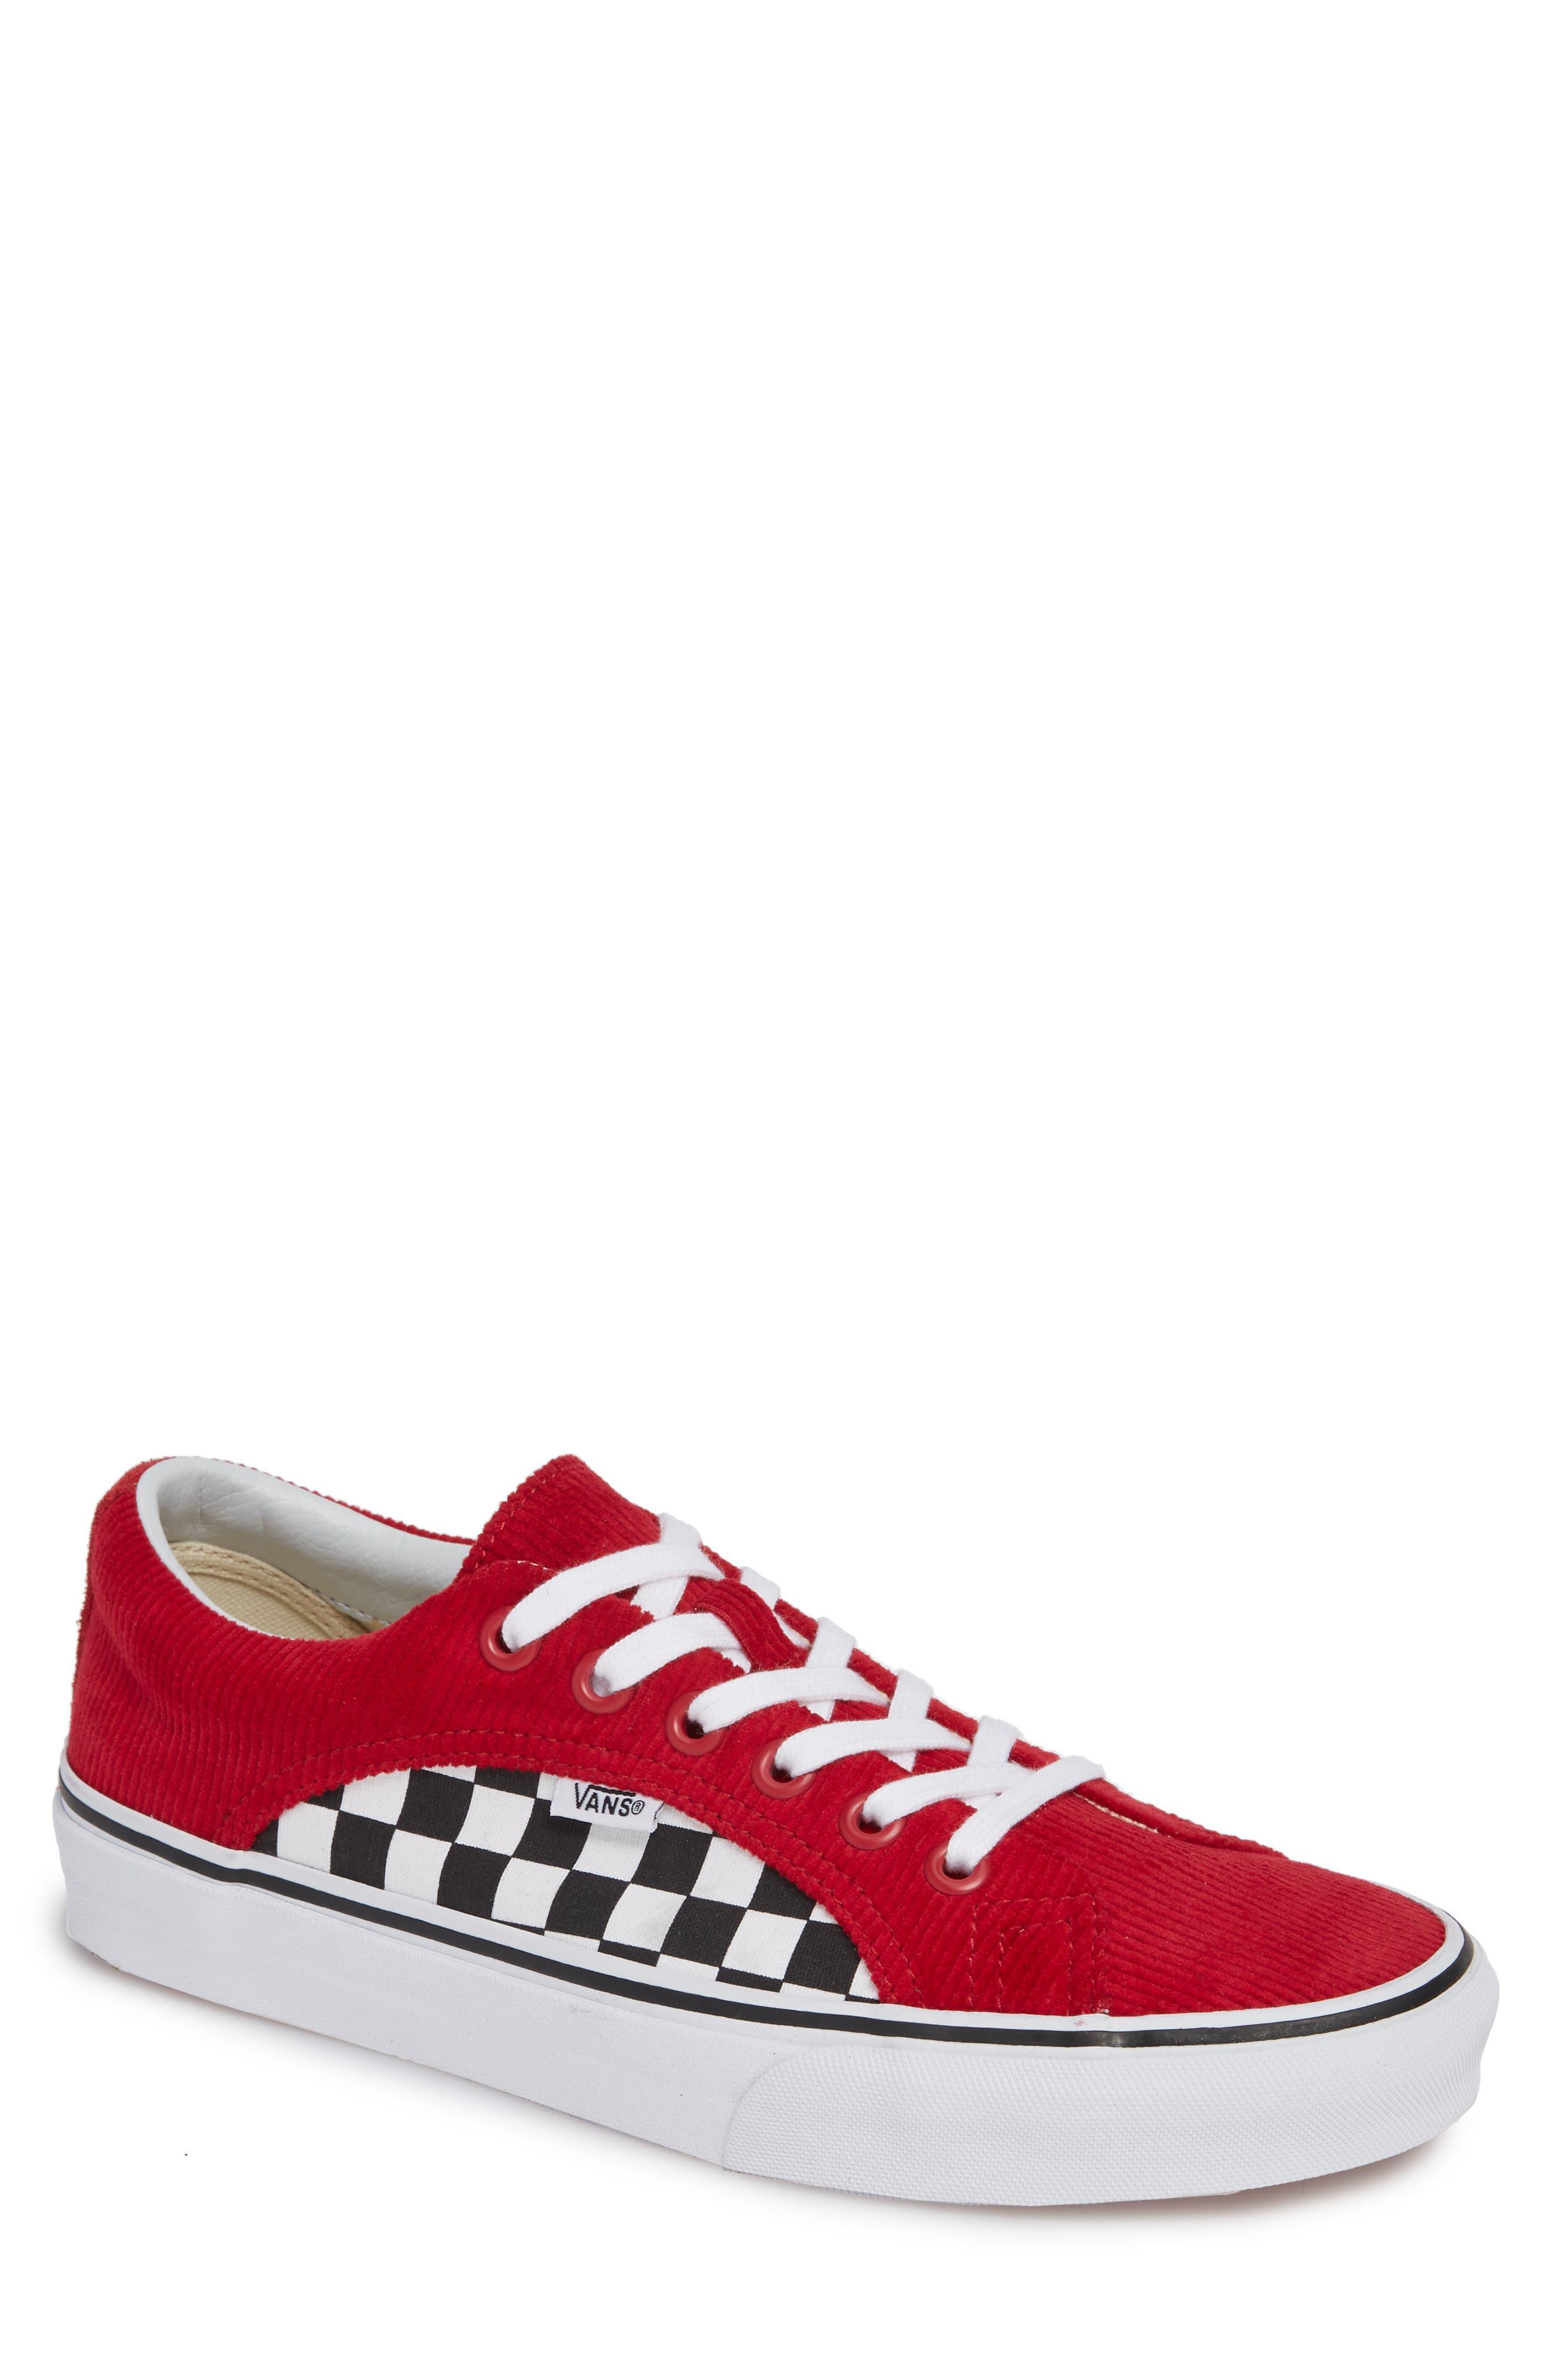 Lampin Corduroy Sneaker,                         Main,                         color, SCOOTER/ TRUE WHITE CANVAS